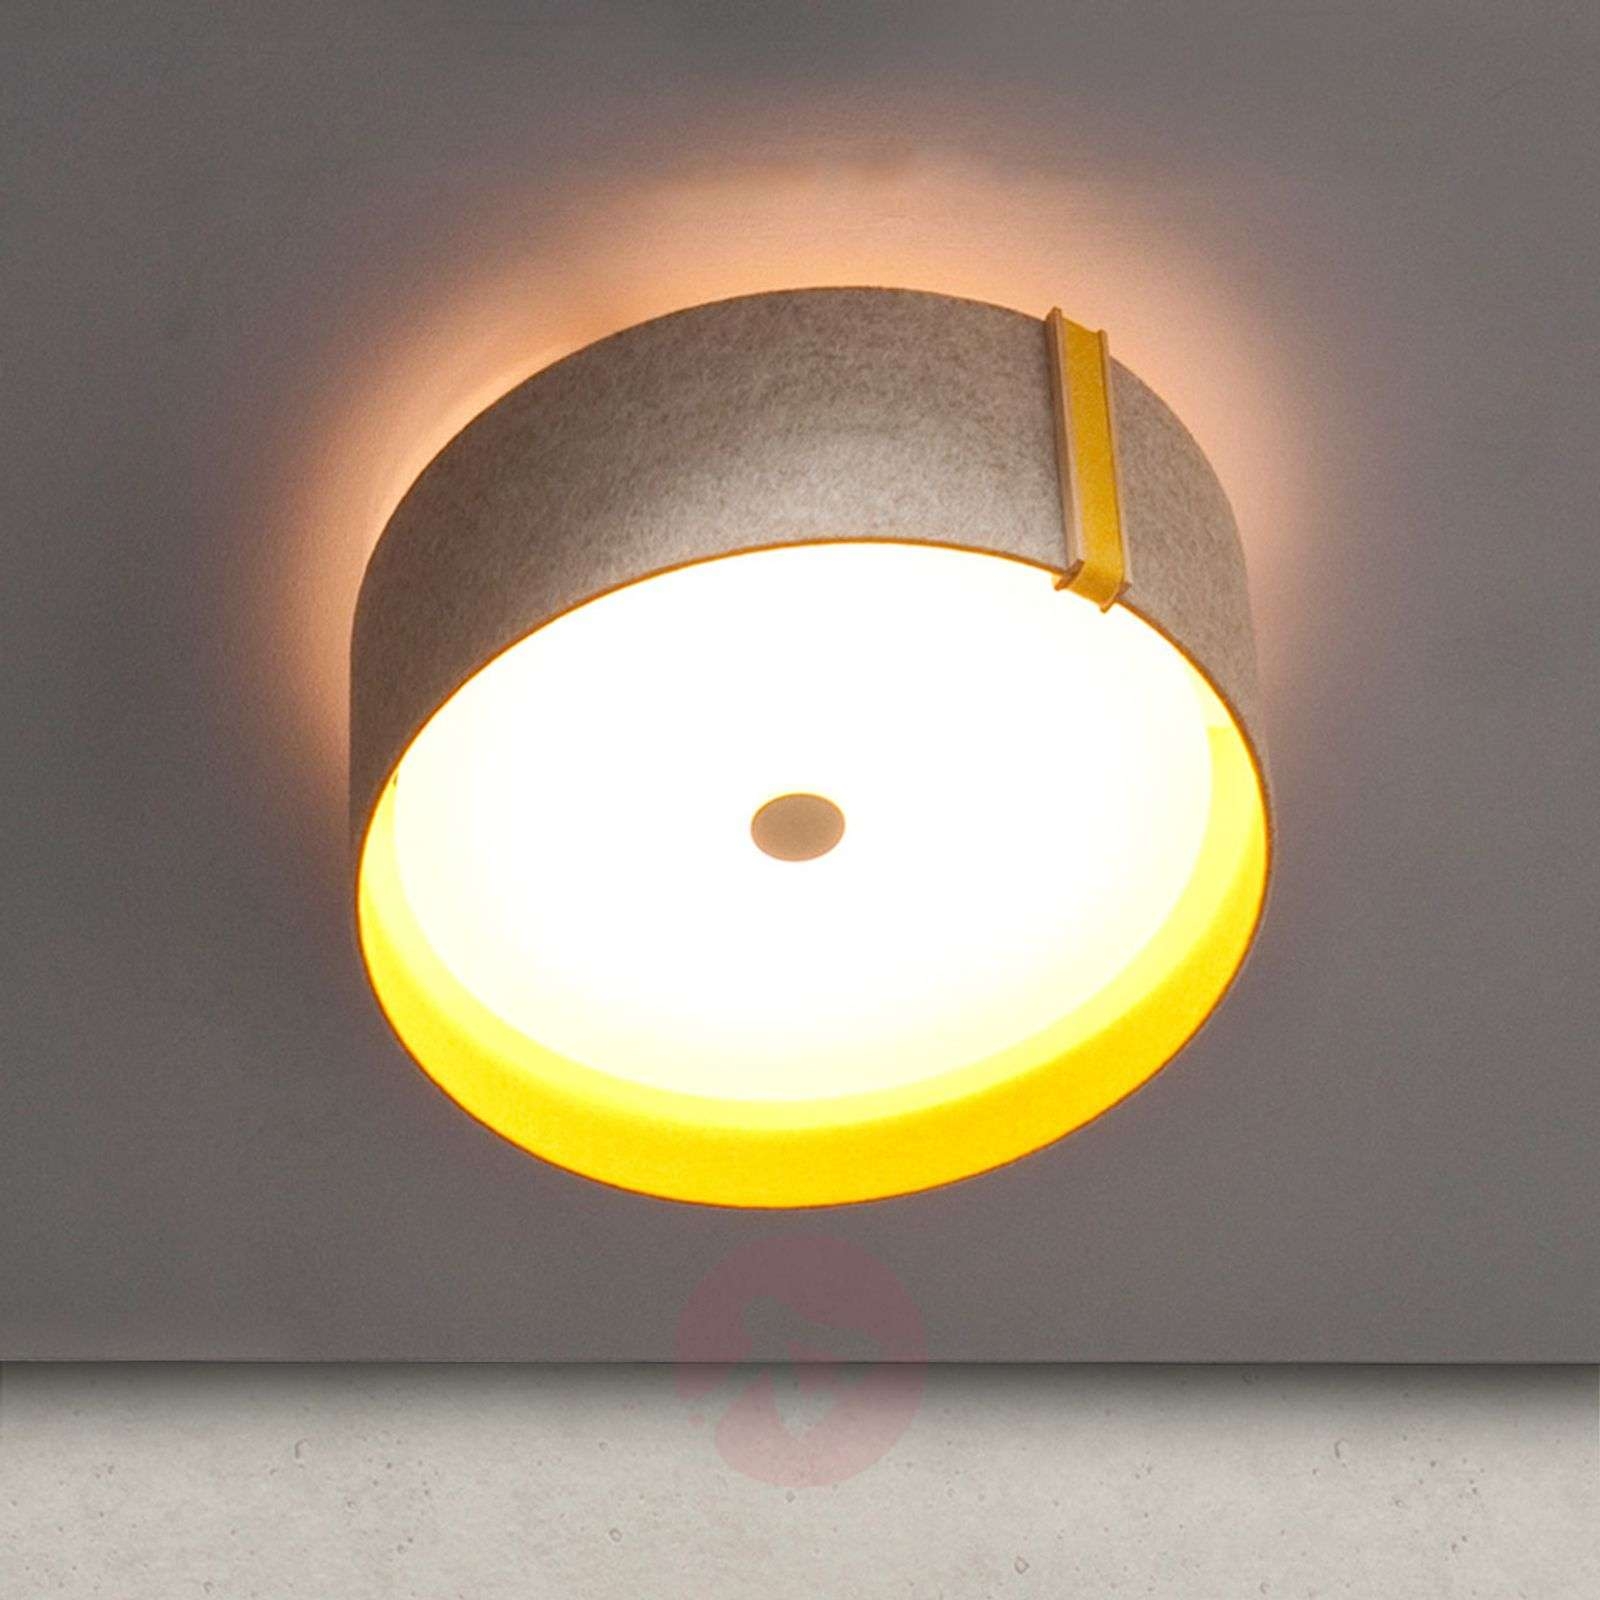 Lara felt-kattovalo huovasta, LED, harmaa-curry-2600509-01